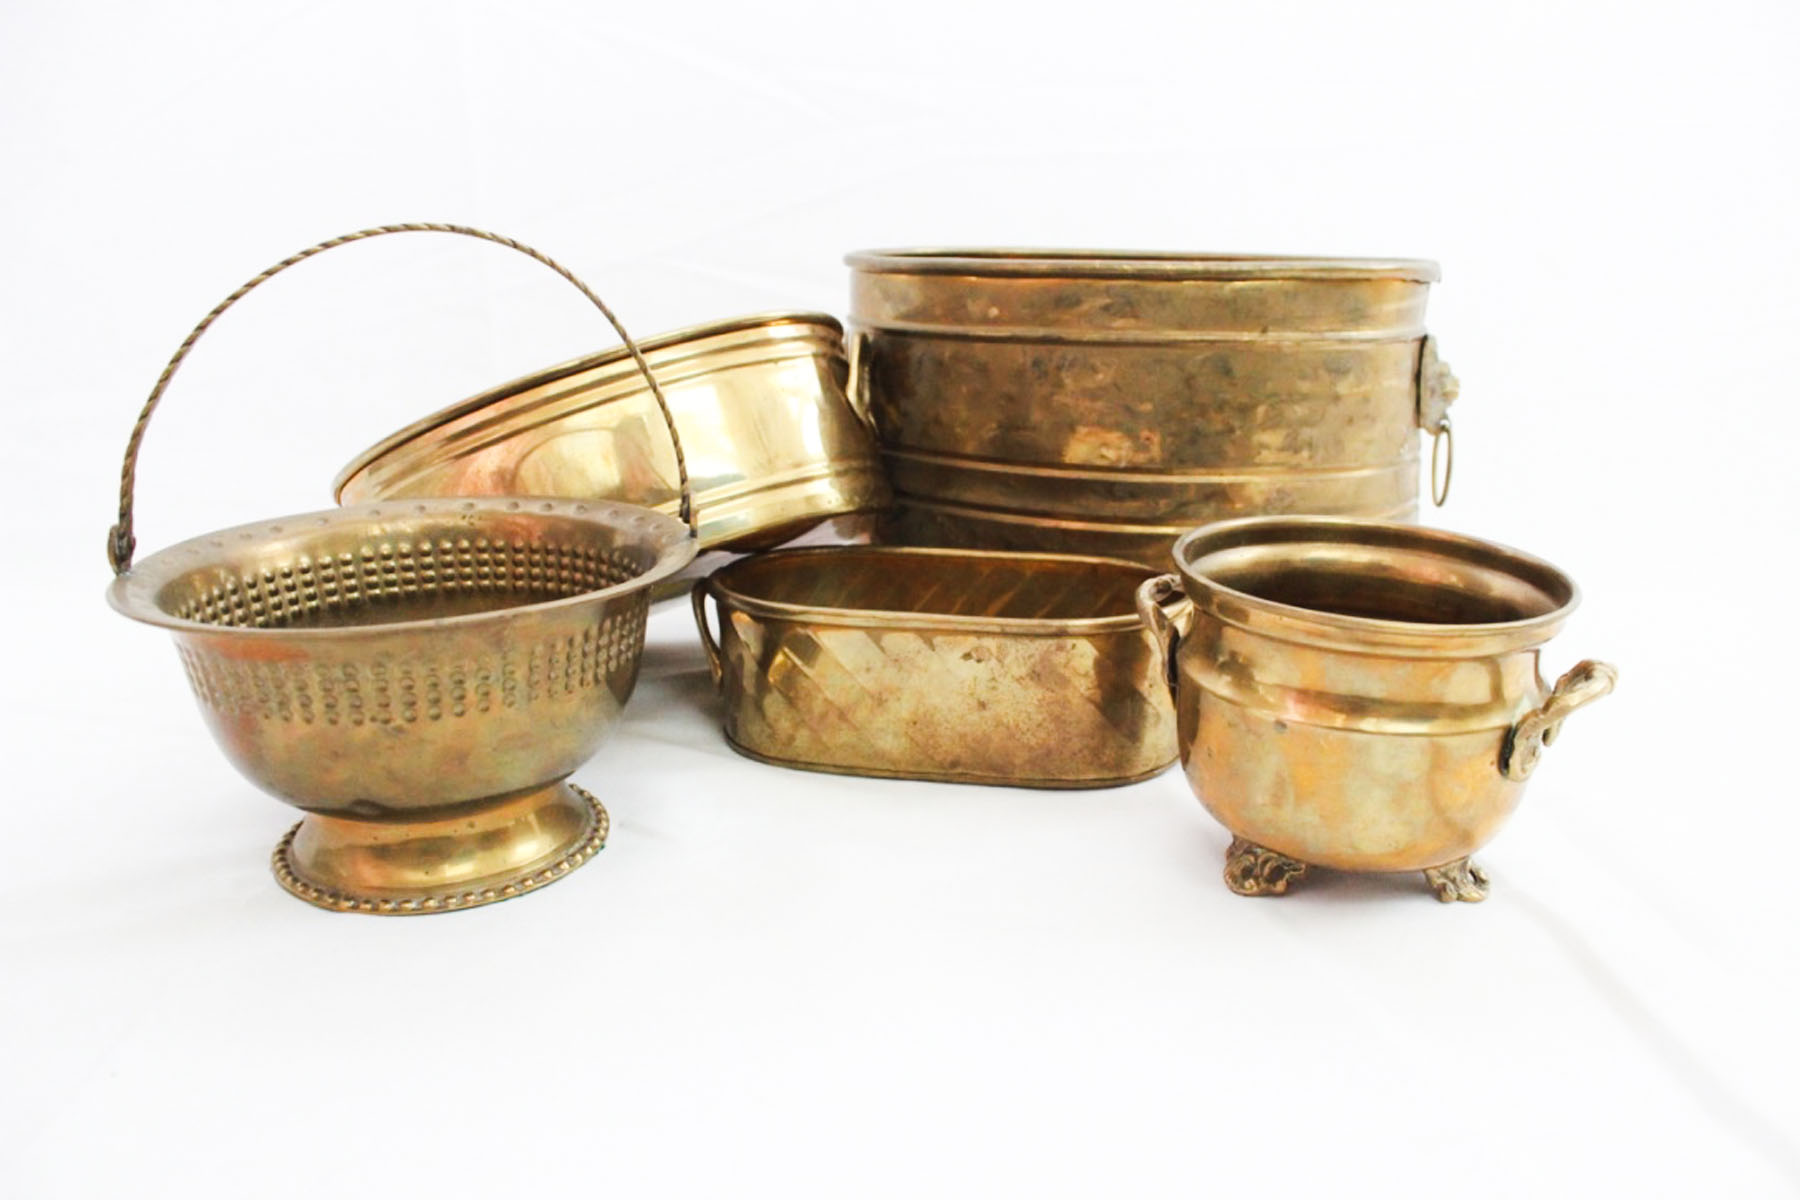 Brass Planters - Scavenged Vintage